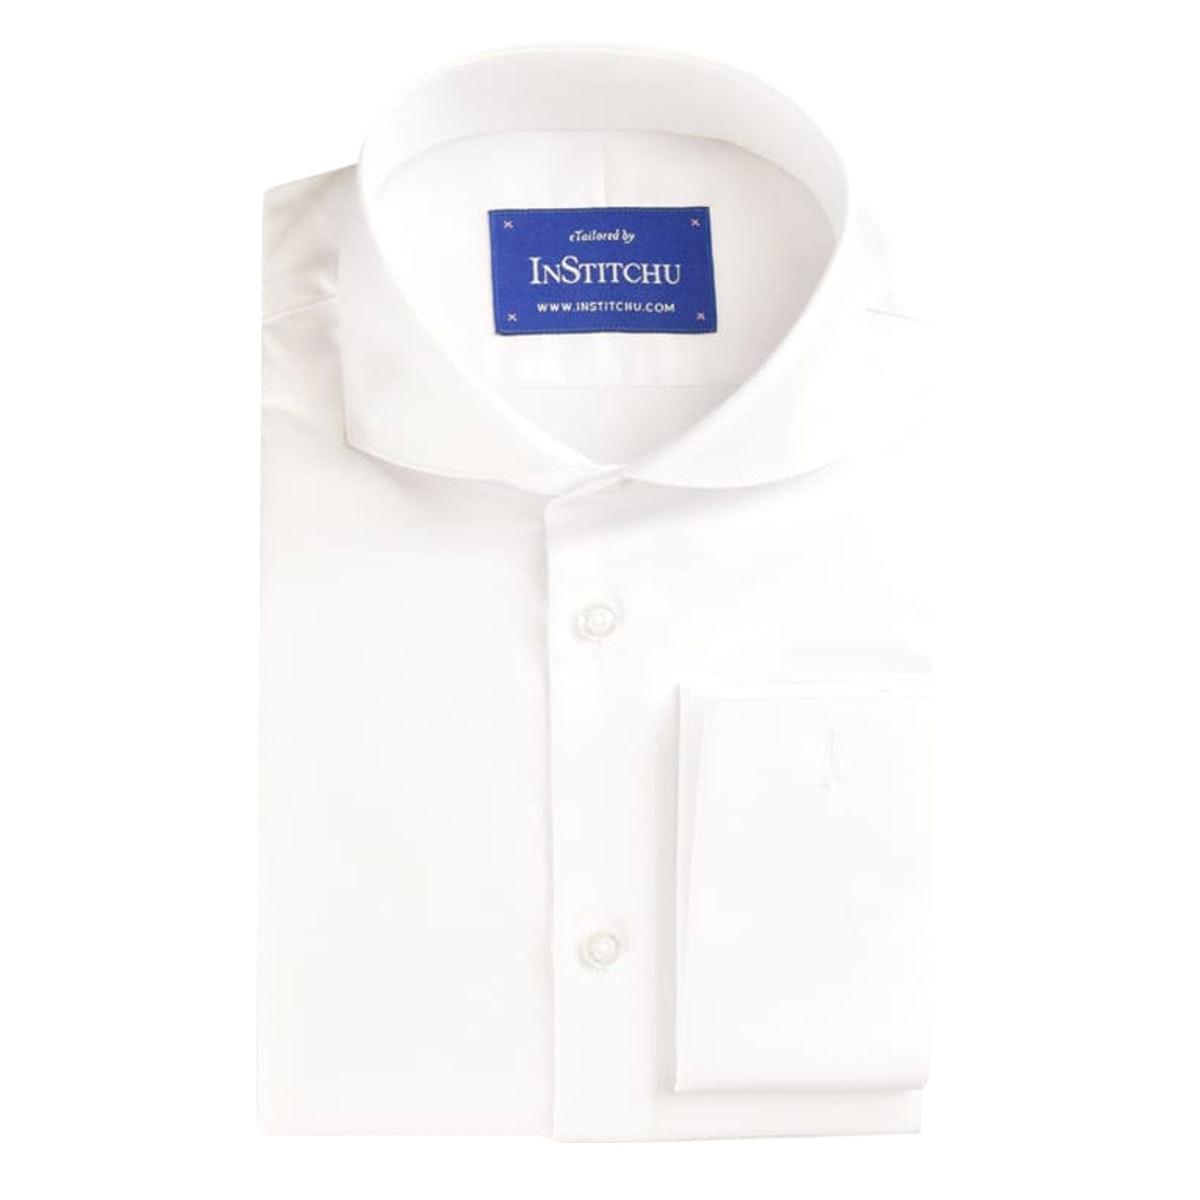 InStitchu Collection Pinnacle White Herringbone Cotton